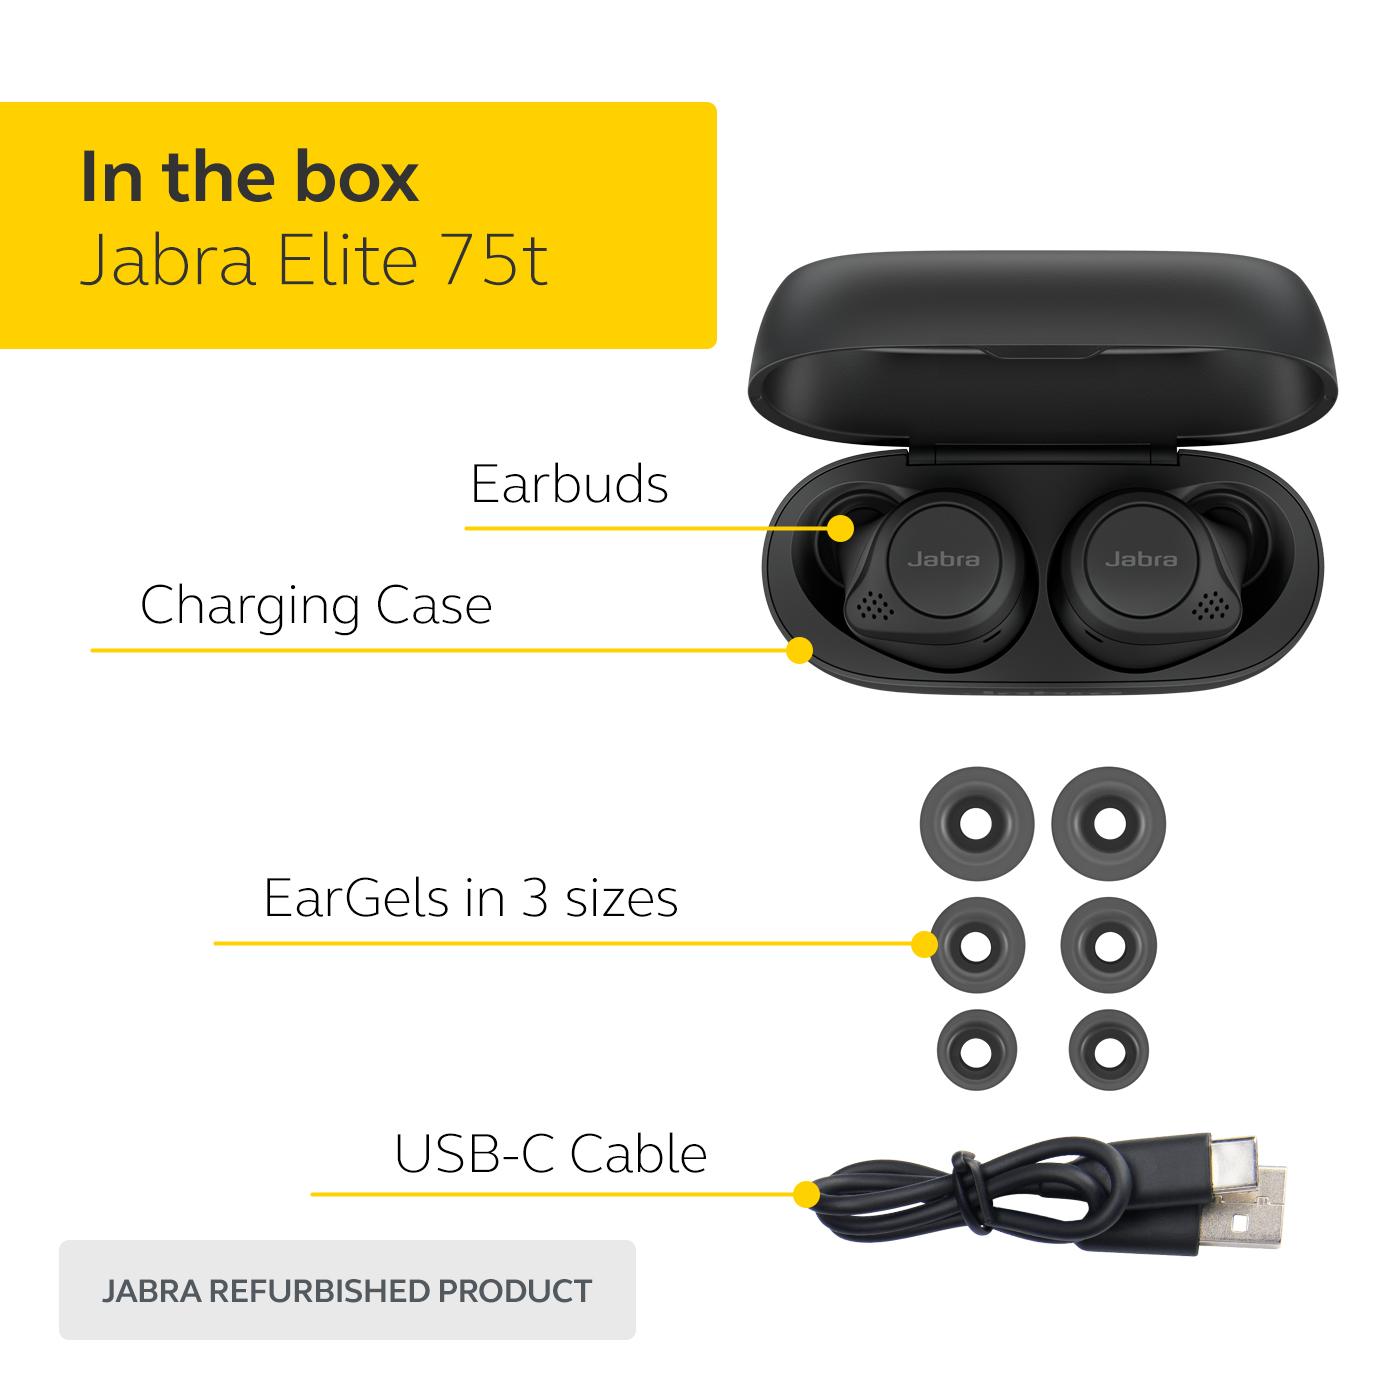 thumbnail 10 - Jabra-Elite-75t-Voice-Assistant-True-Wireless-earbuds-Certified-Refurbished